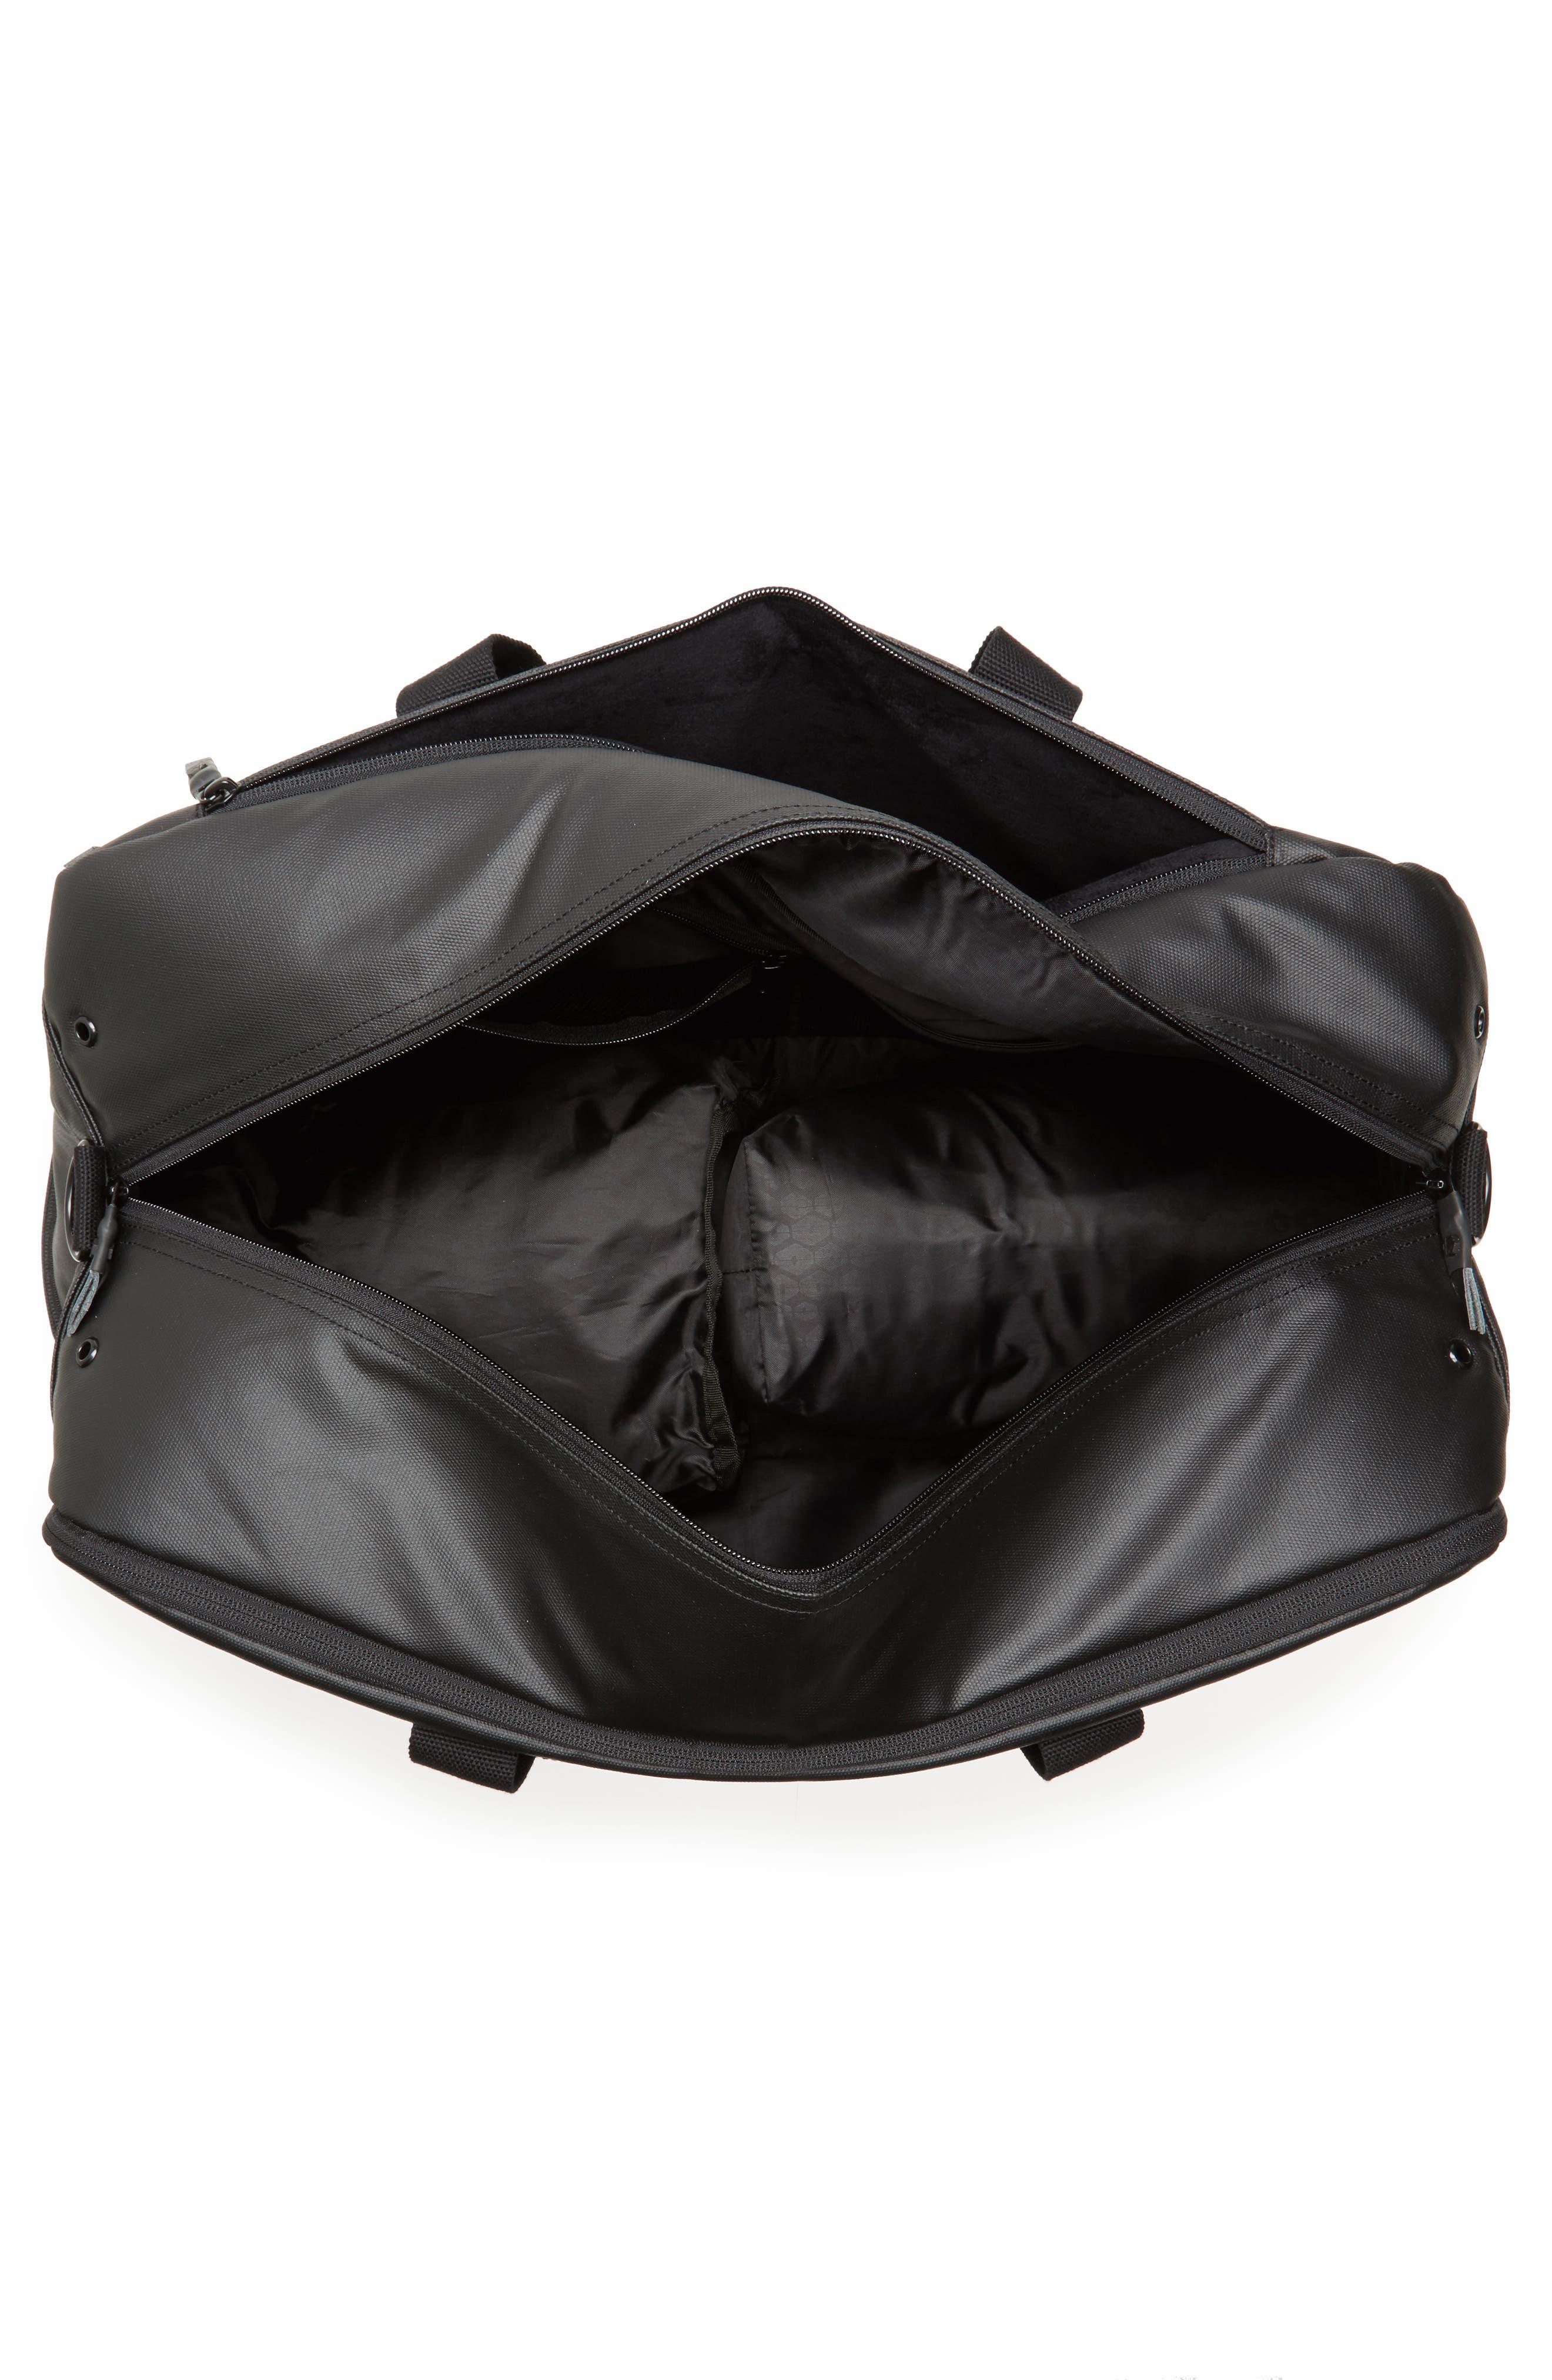 Convertible Duffel Bag,                             Alternate thumbnail 4, color,                             001